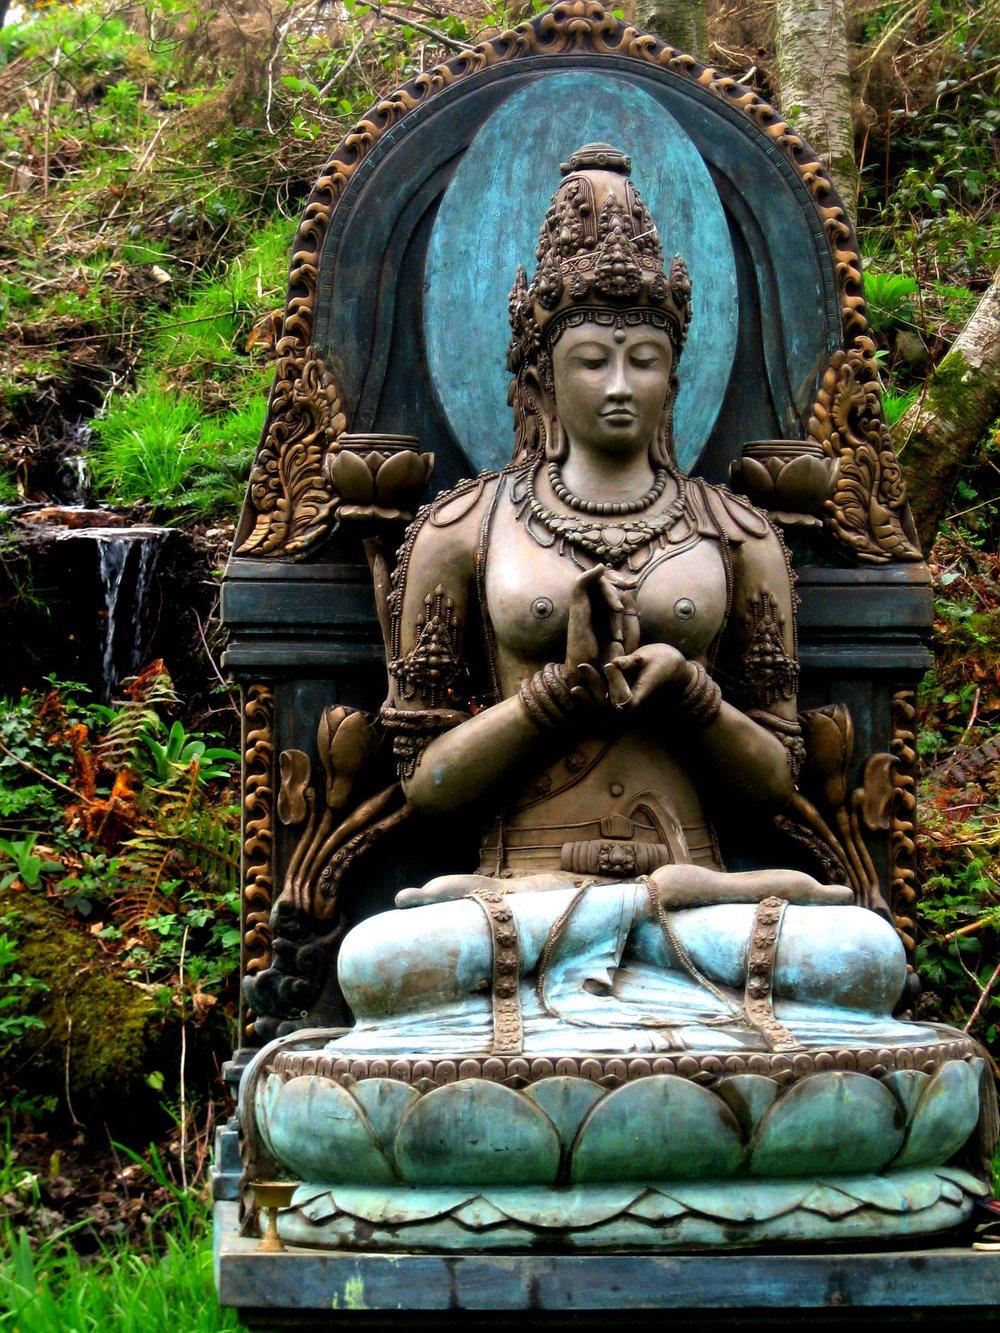 Prajnaparamita, the Perfection of Wisdom